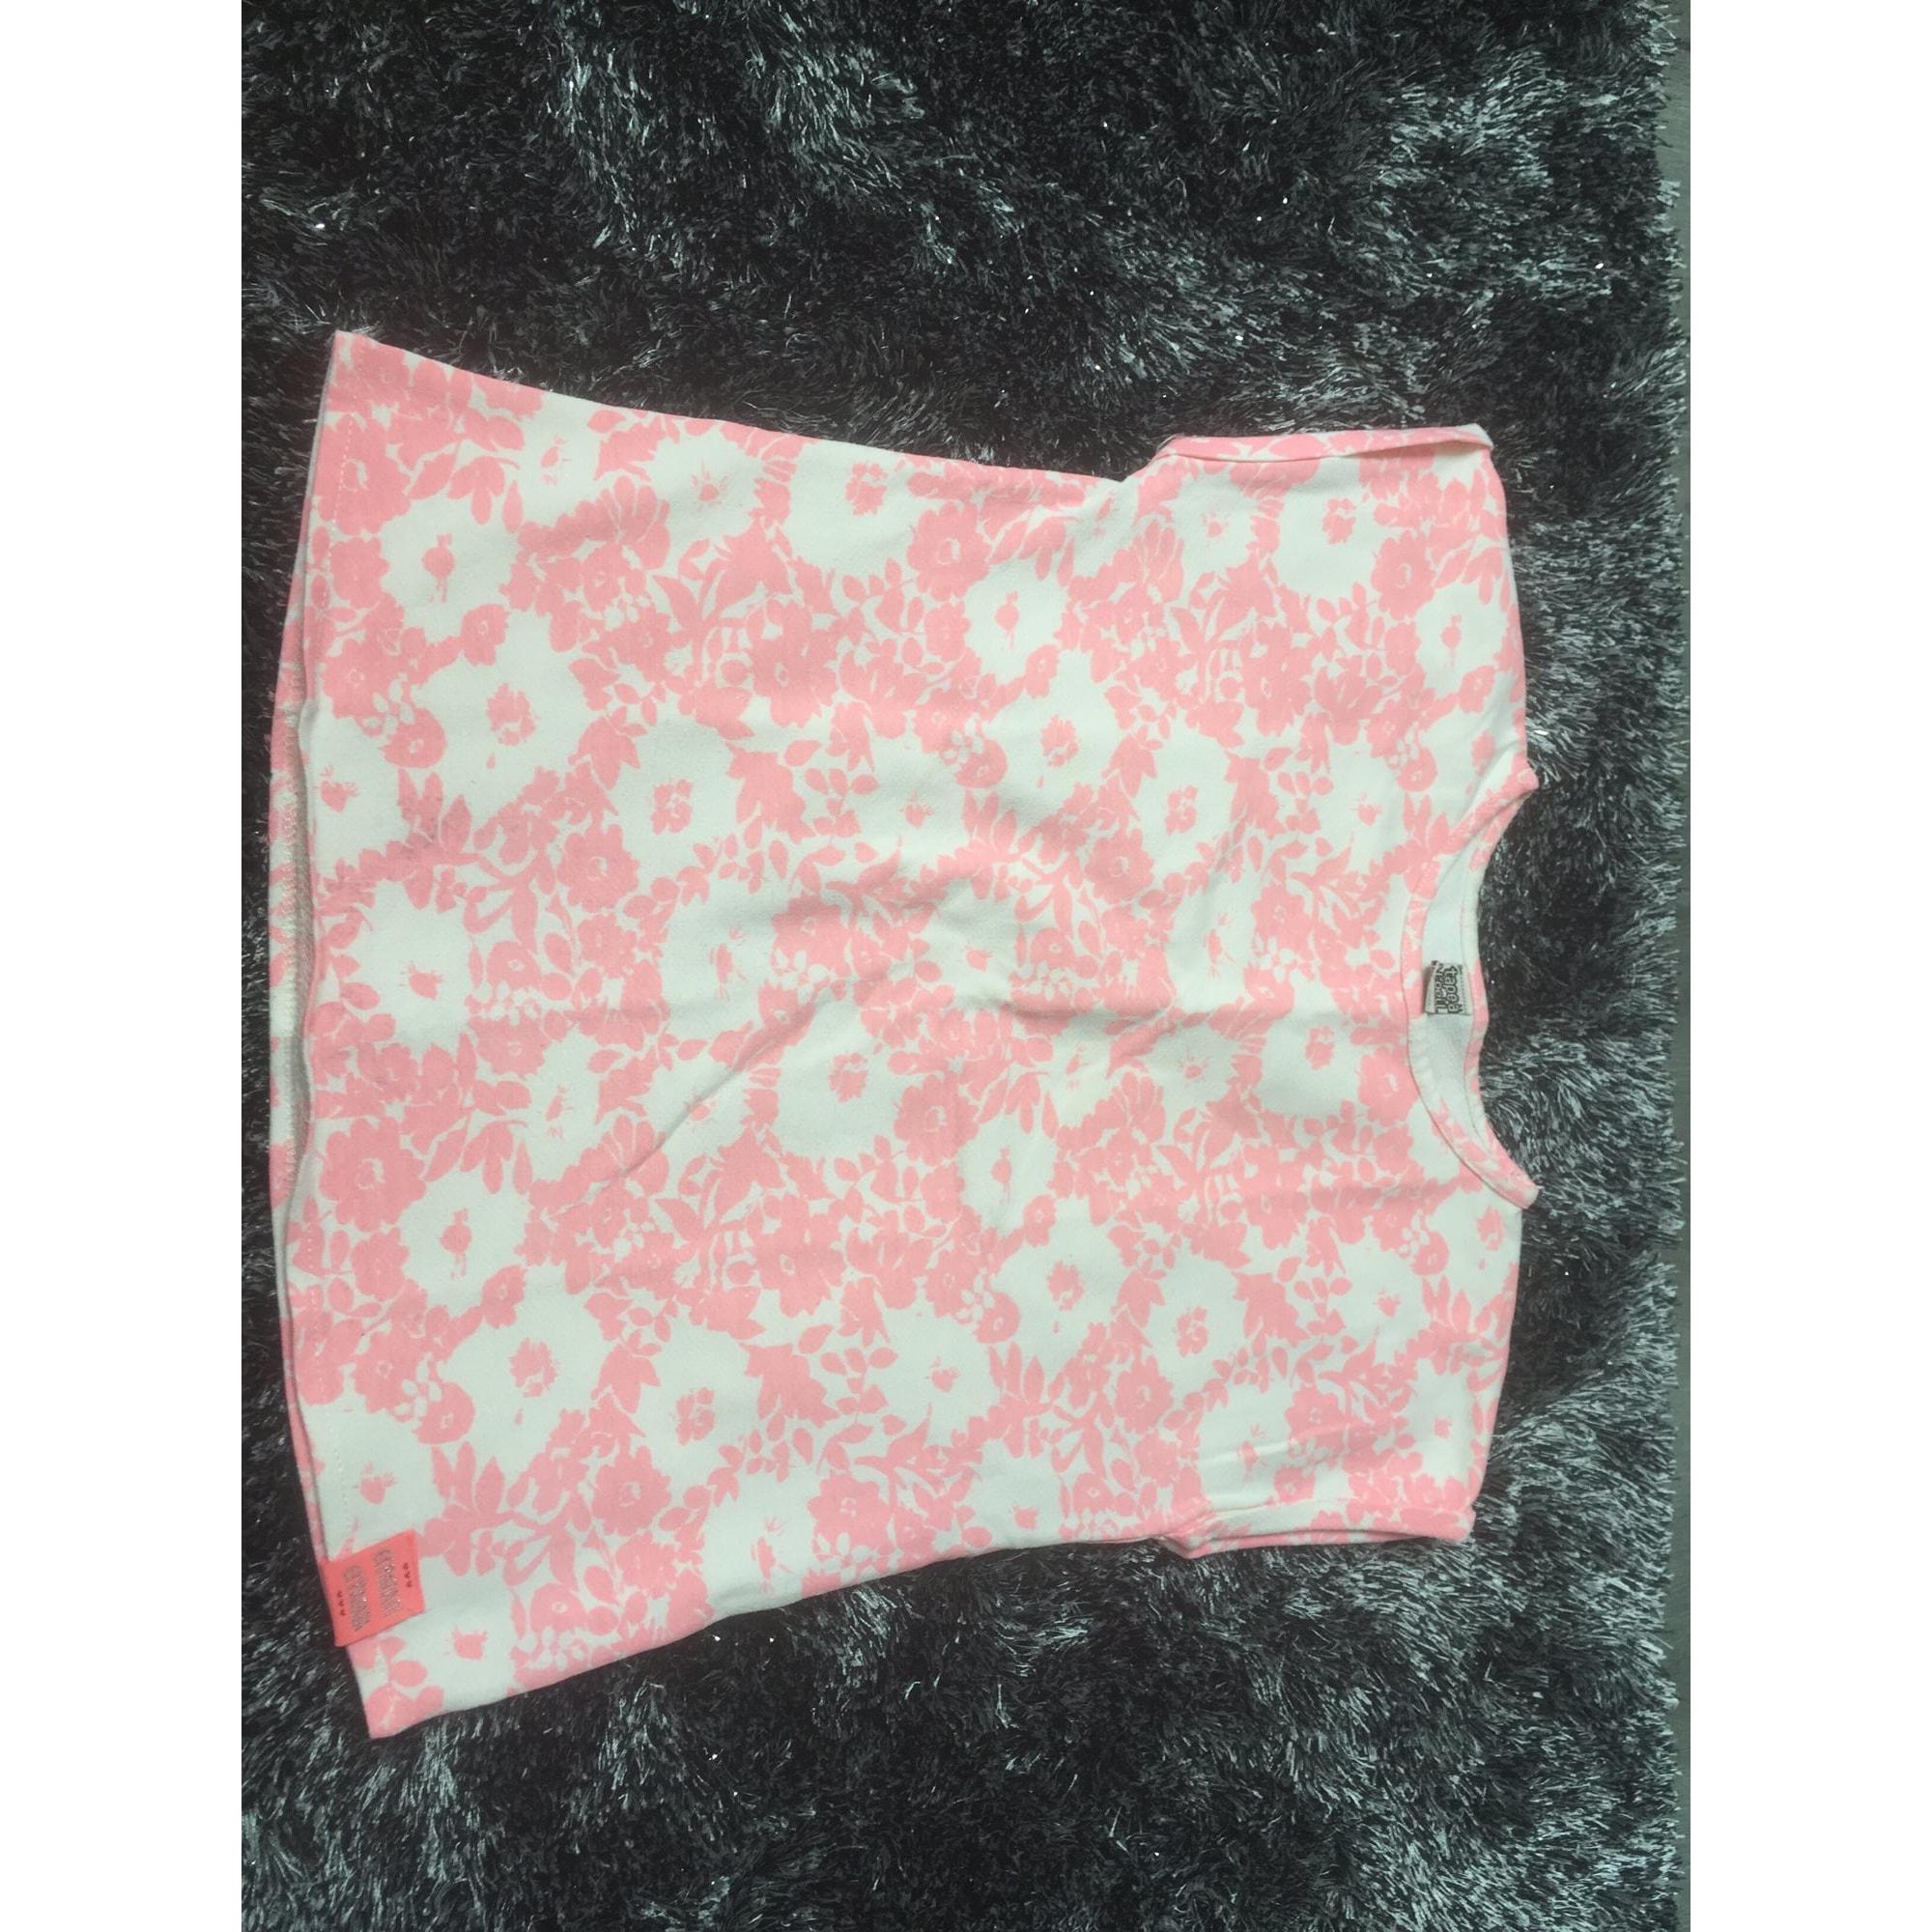 Top, Tee-shirt TAPE À L'OEIL Rose, fuschia, vieux rose